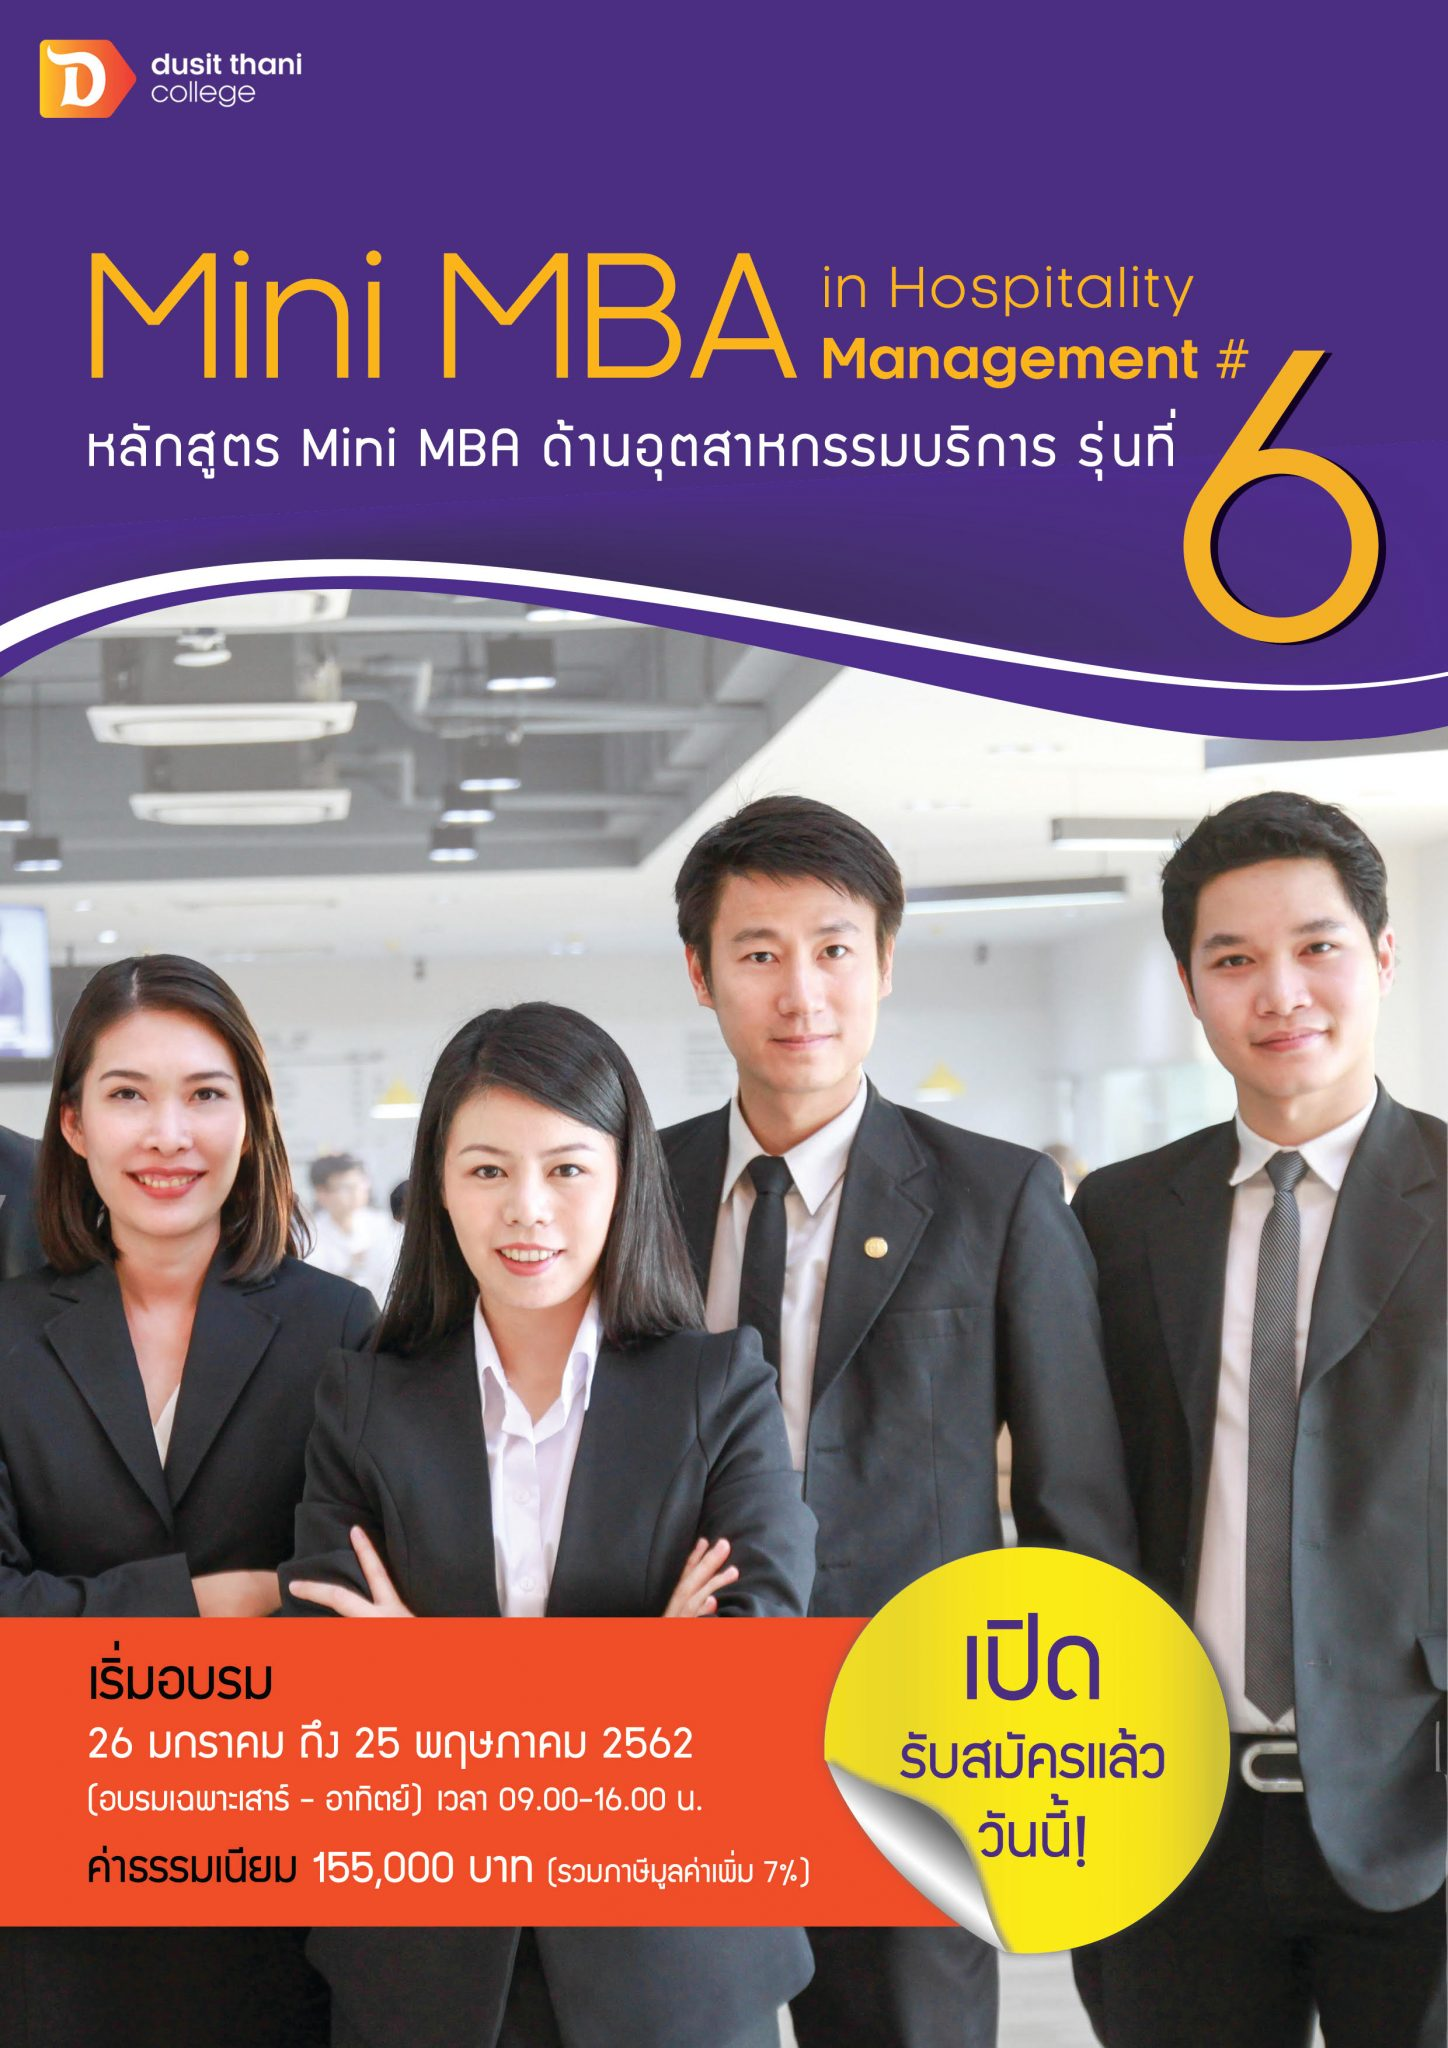 Mini MBA ด้านอุตสาหกรรมบริการ รุ่นที่ 6* 13 -